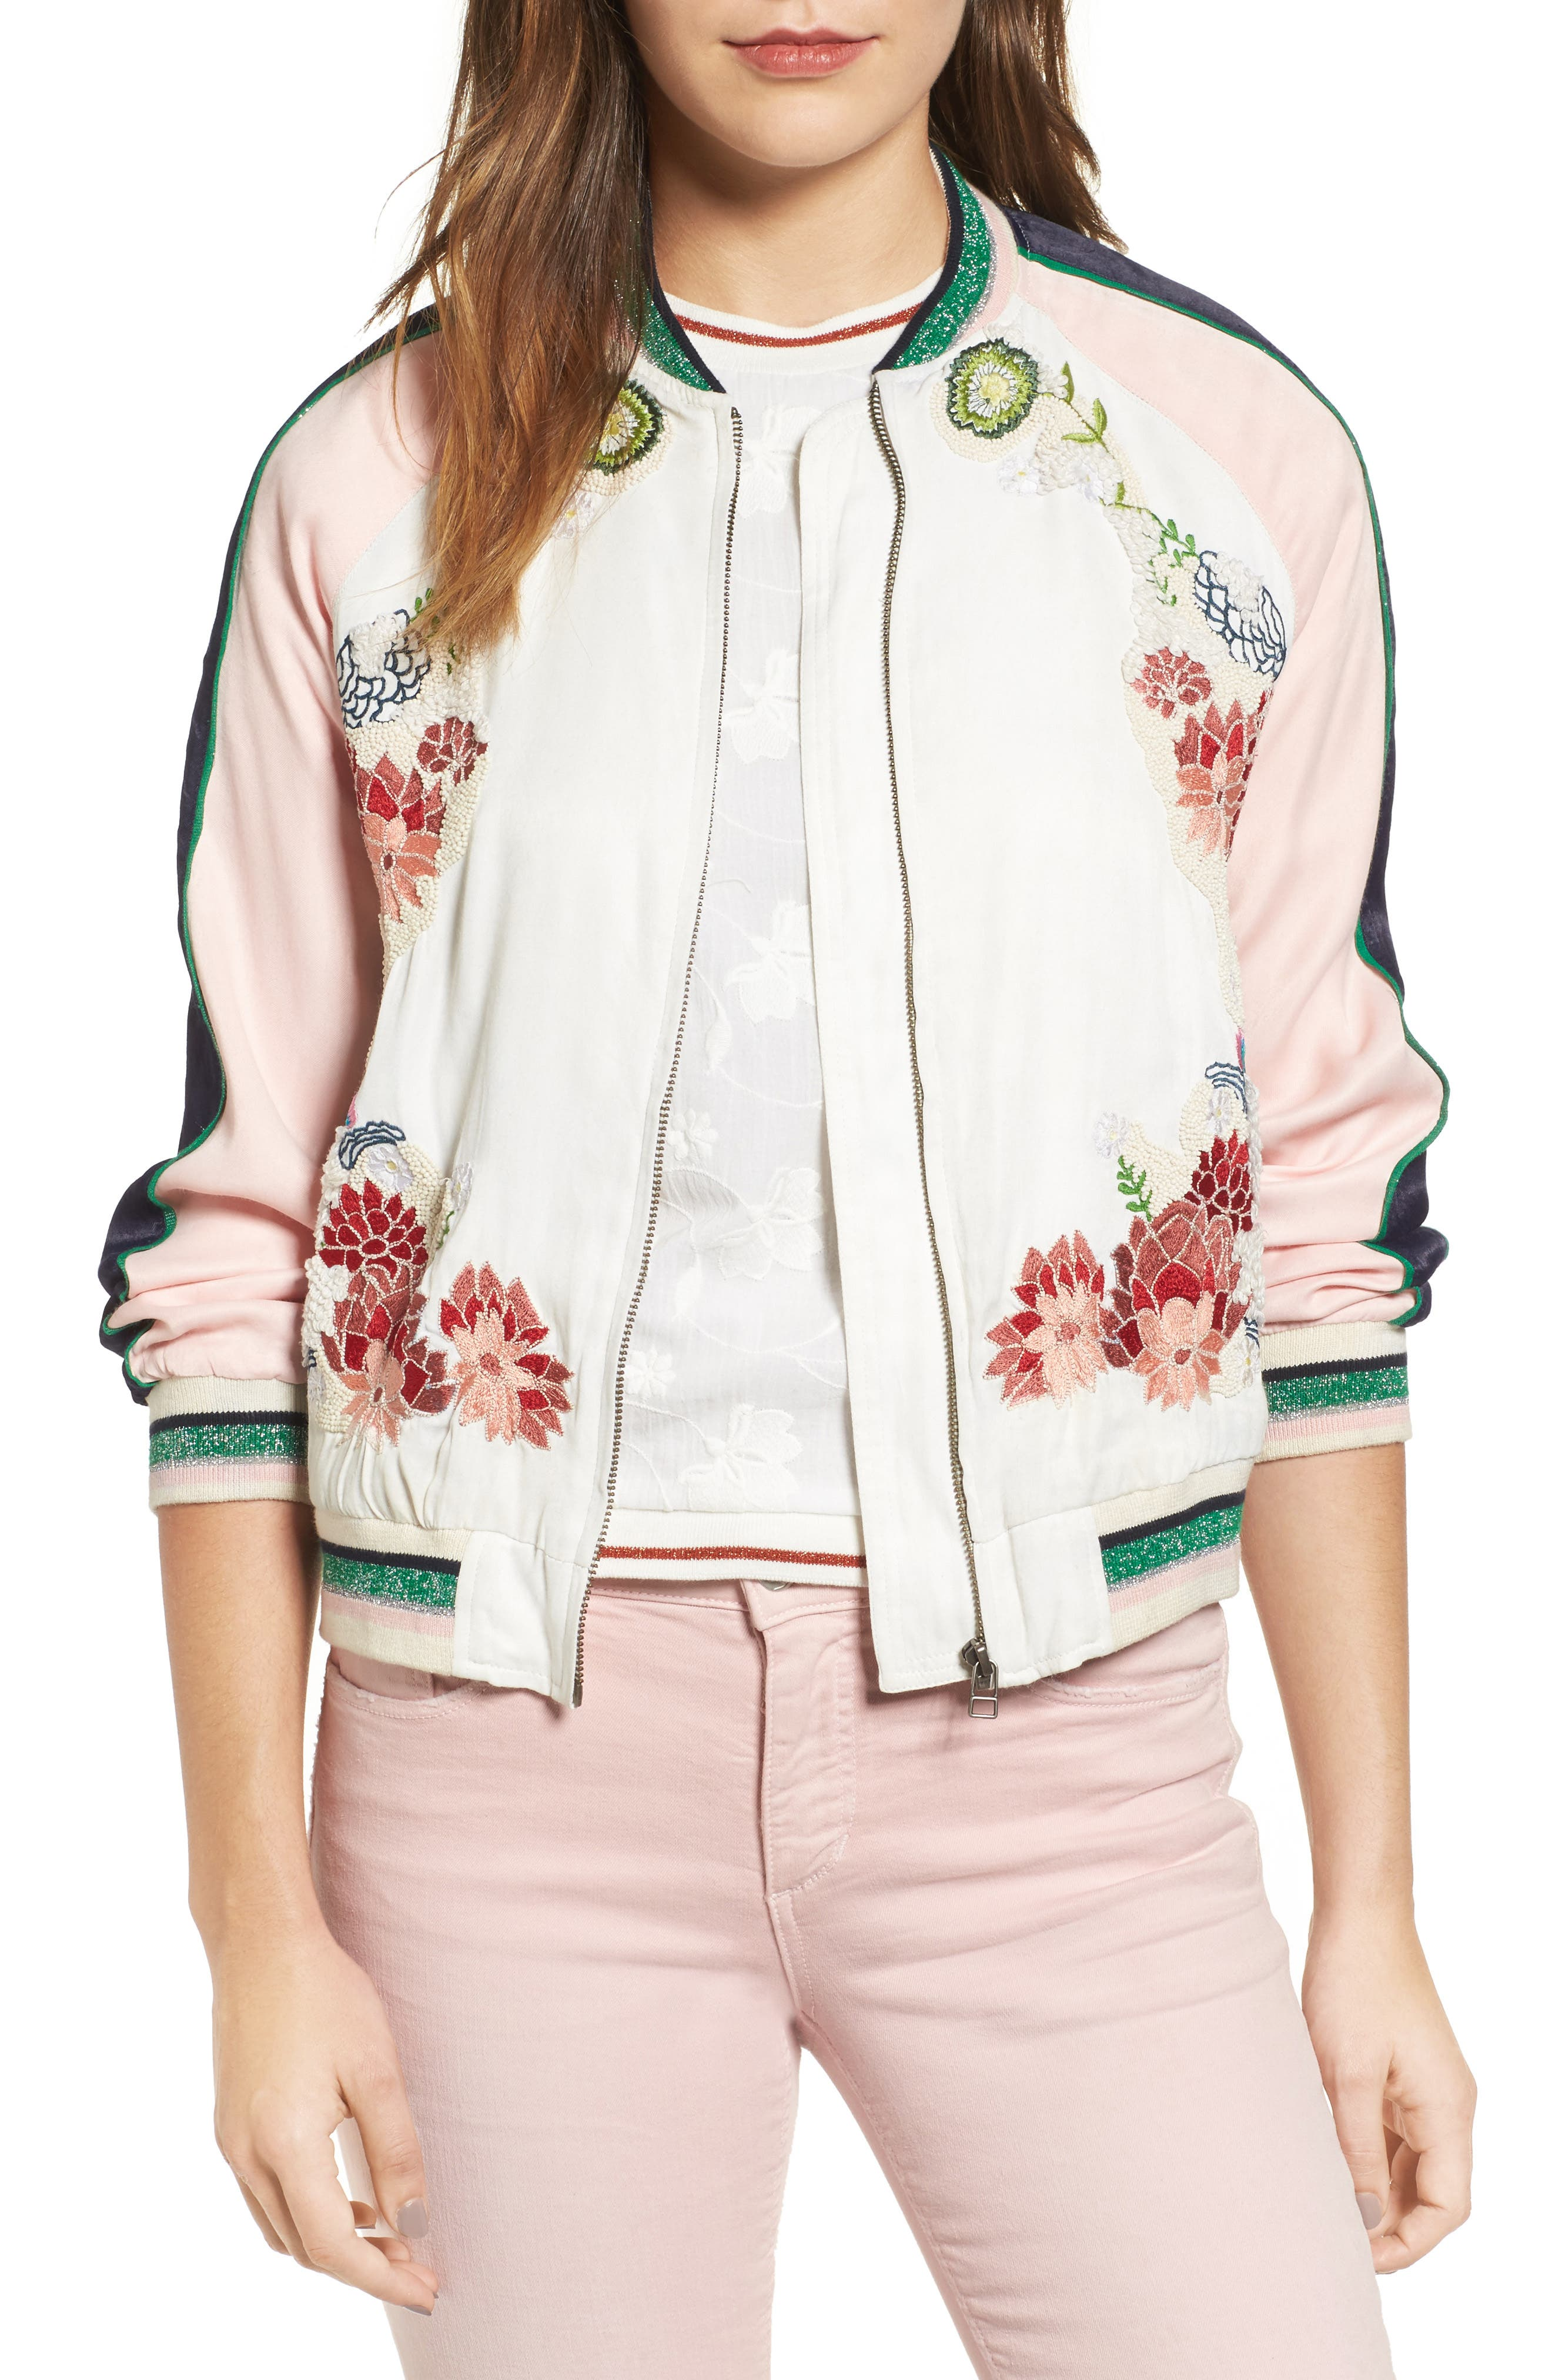 Main Image - Paul & Joe Sister Les Fleurs Embroidered Bomber Jacket